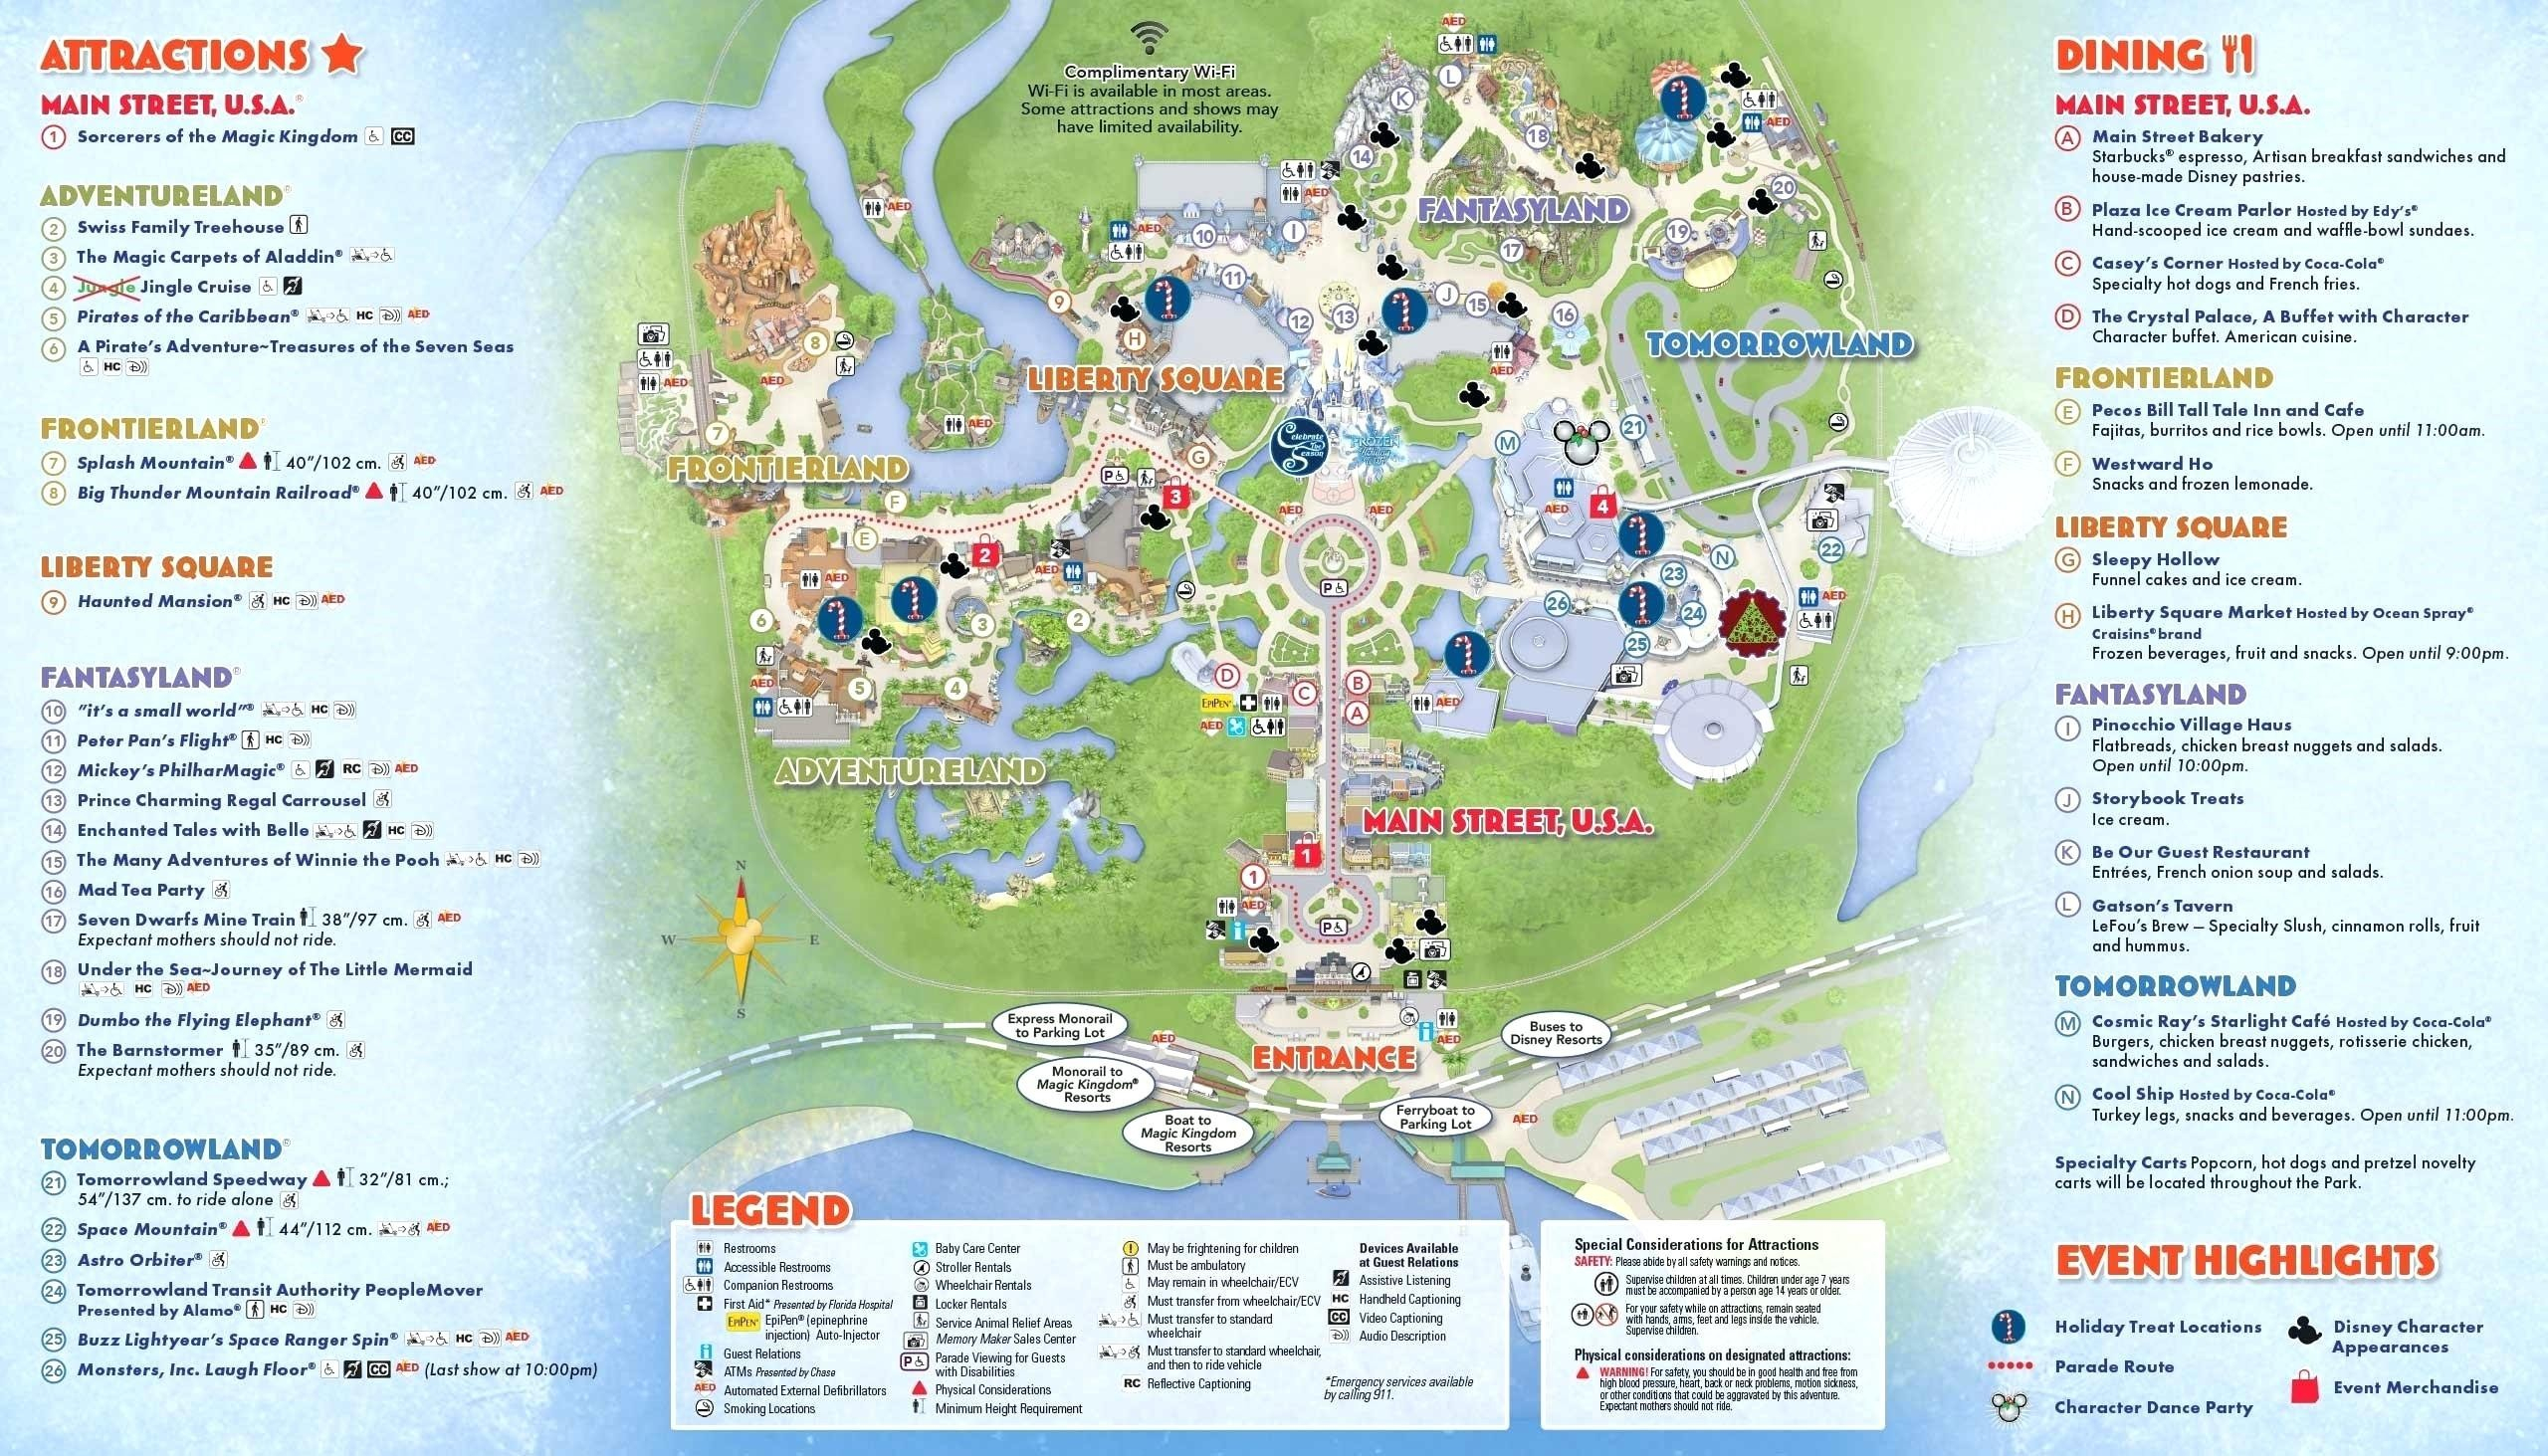 Printable Disney World Maps 2017 Awesome Google Map Orlando Copy - Printable Disney World Maps